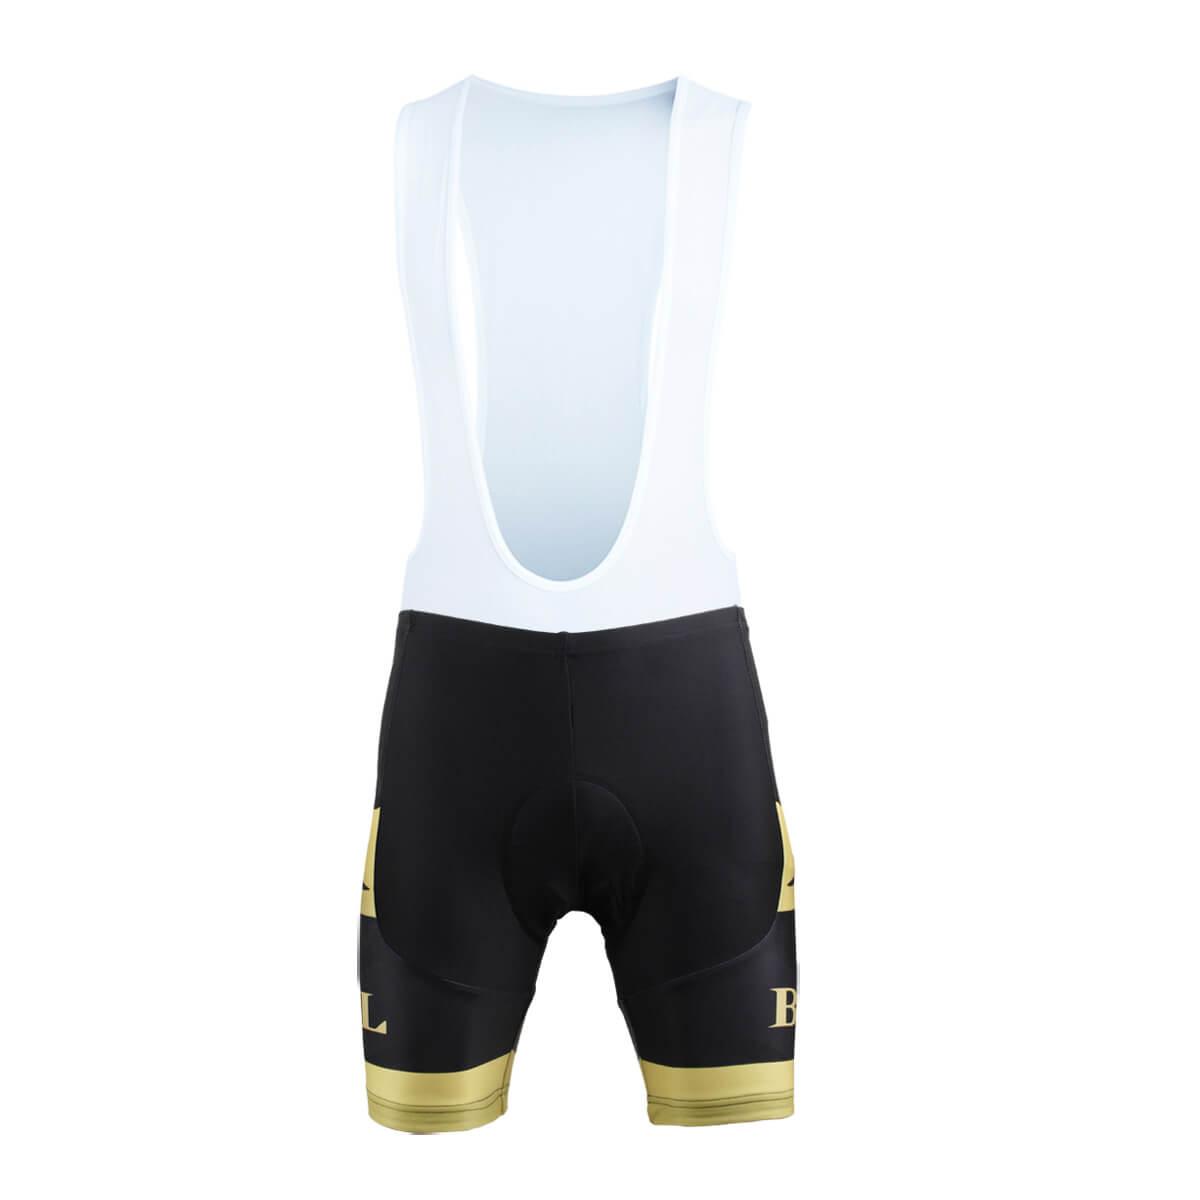 Cool Bull Design Padded Bib Cycling Shorts For Men S Chogory